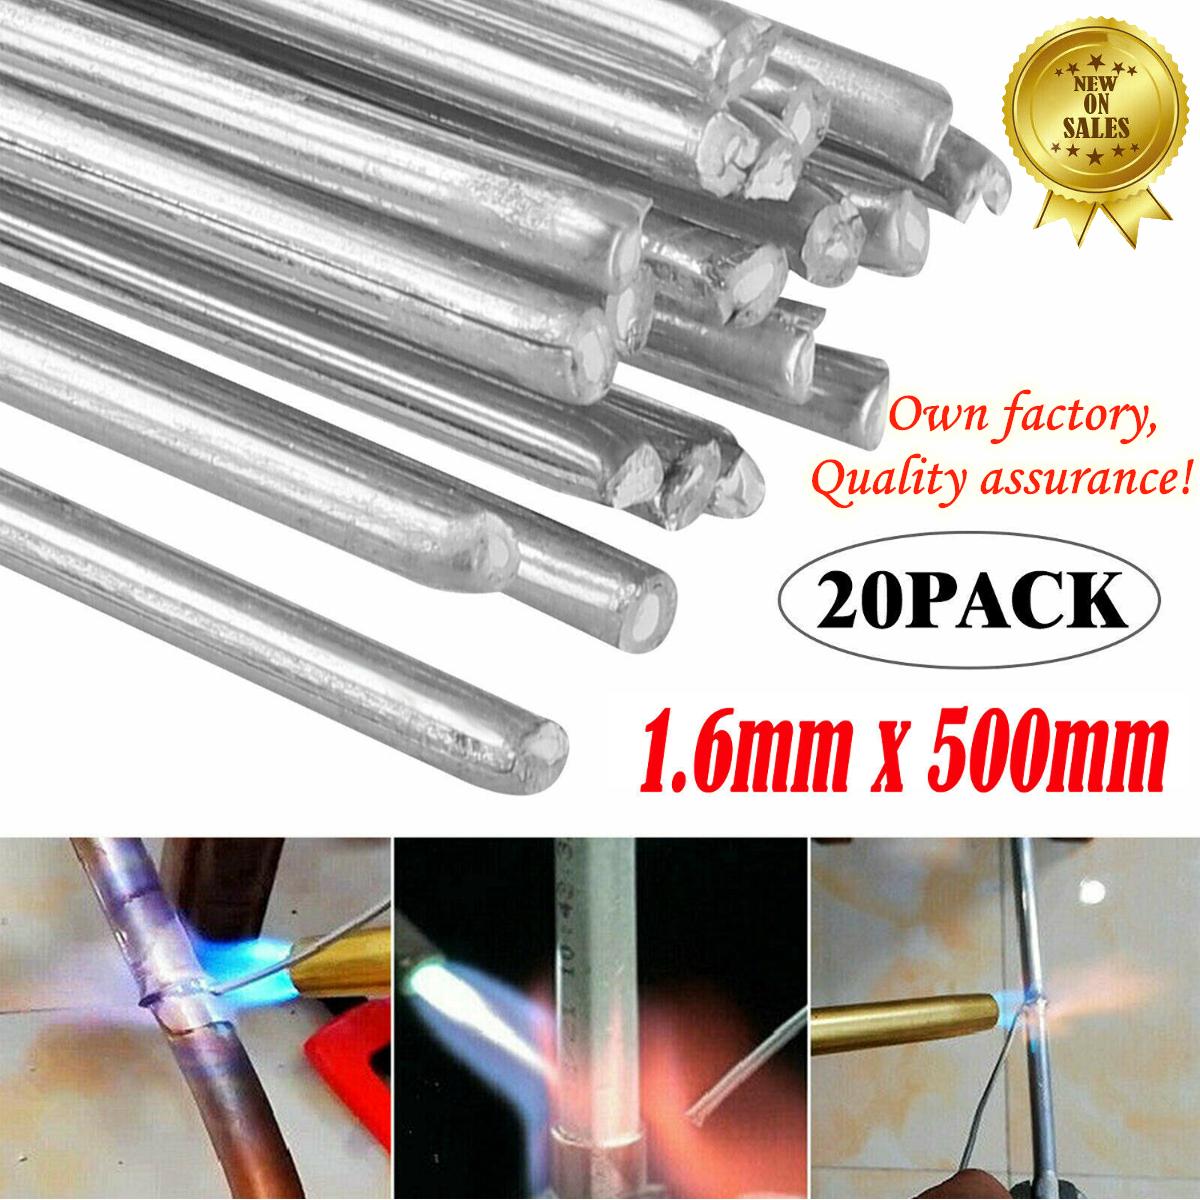 50 PCS Solution Welding Flux-Cored Rods No Flux Required,Low Temperature Aluminum Welding Wire